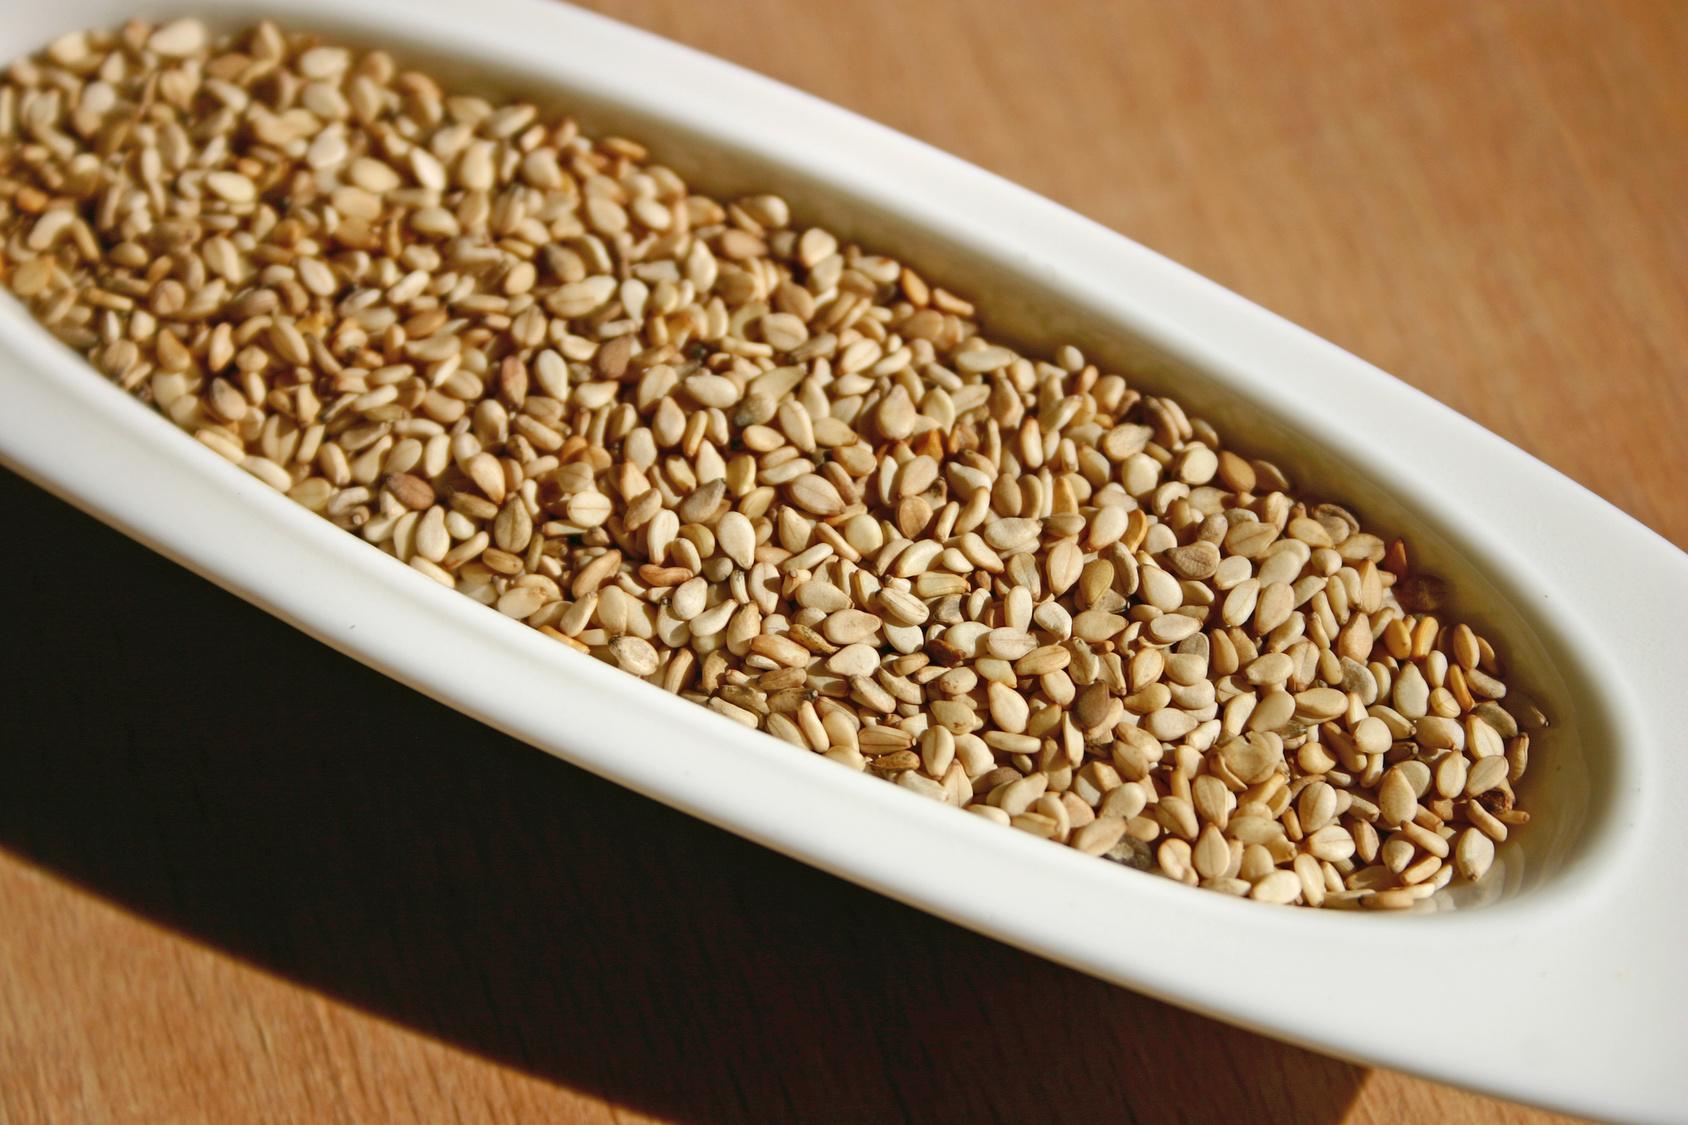 Recetas de semillas de sésamo rubio - Kitchen / Madame Figaro